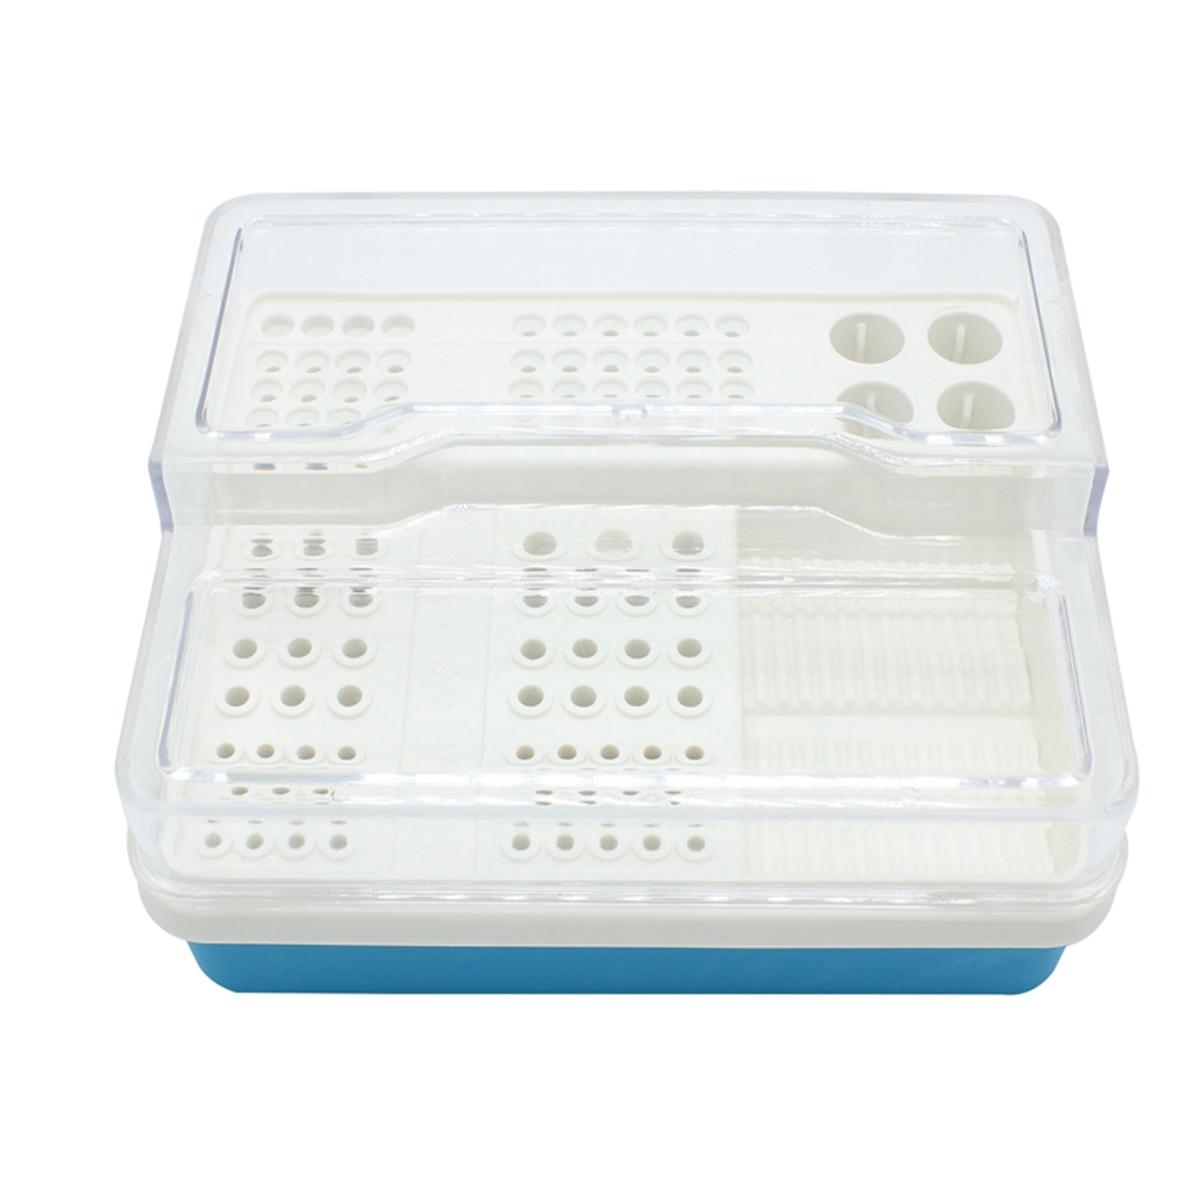 Dental Endo Box Endodontics Disinfection Storage Organization For RA FG 91Holes + 4Holes + 1Pan Oral Hygiene Teeth Tools